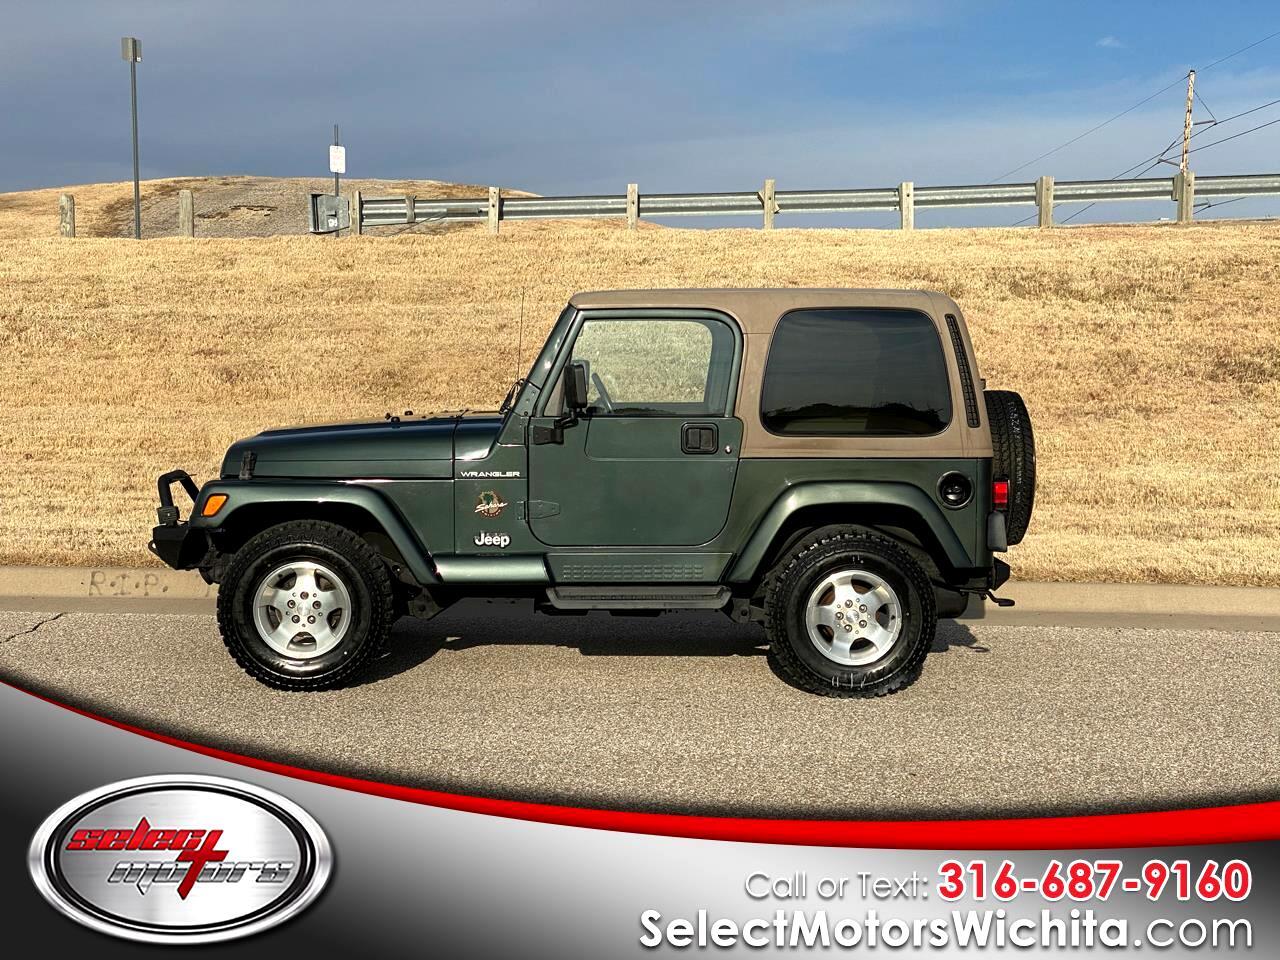 Jeep Wrangler 2dr Sahara 2002